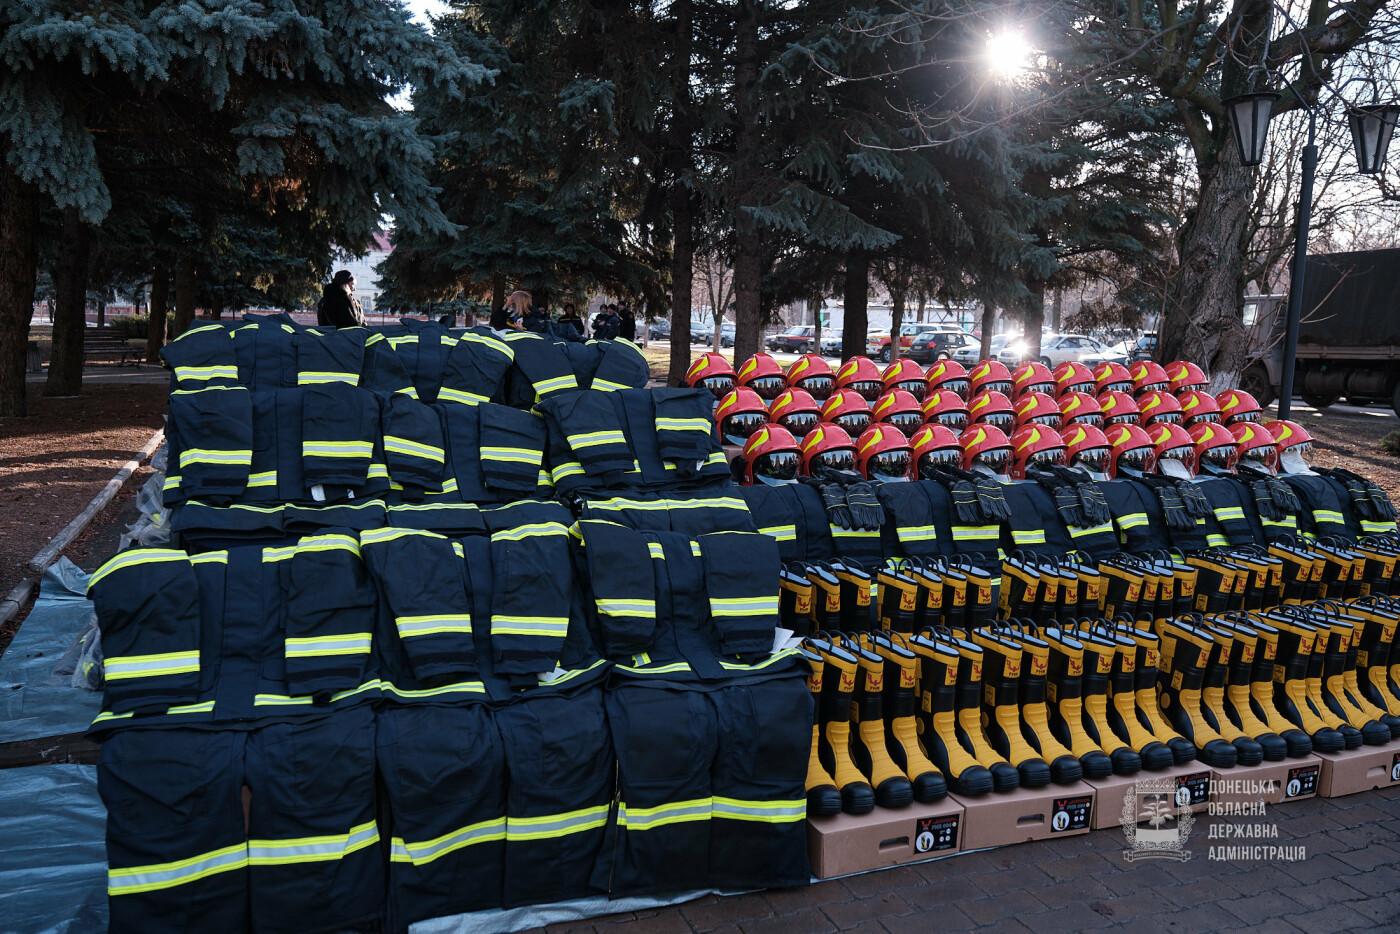 Слов'янські рятувальники отримали нову пожежну автоцистерну, фото-1